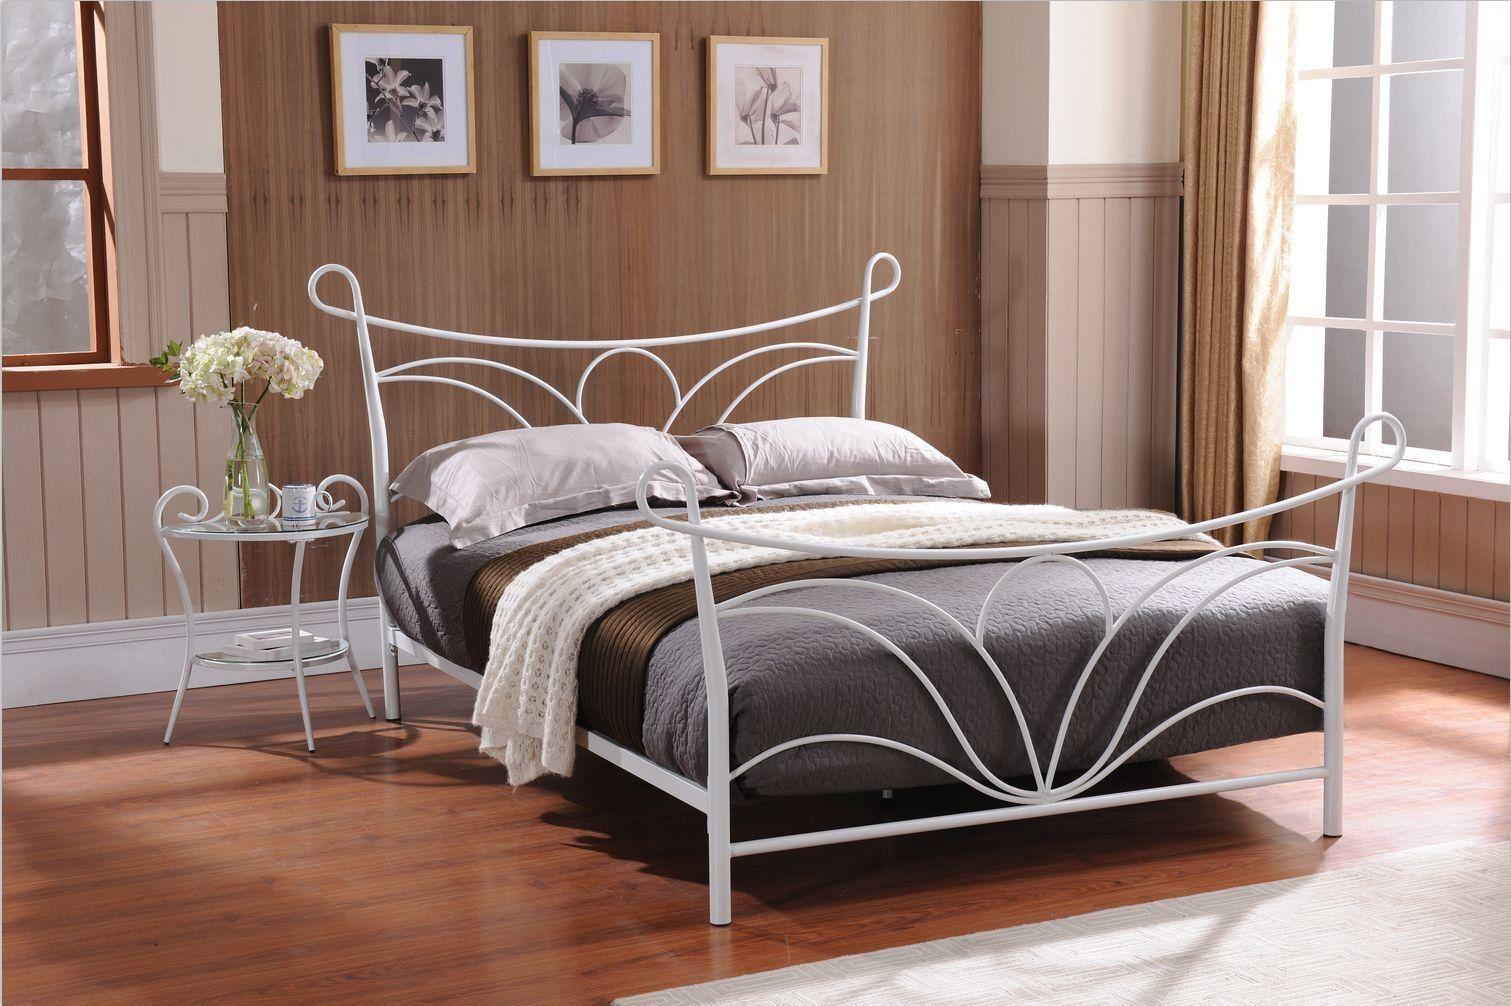 Hammer White Finish Metal Bed, Headboard Footboard Rails